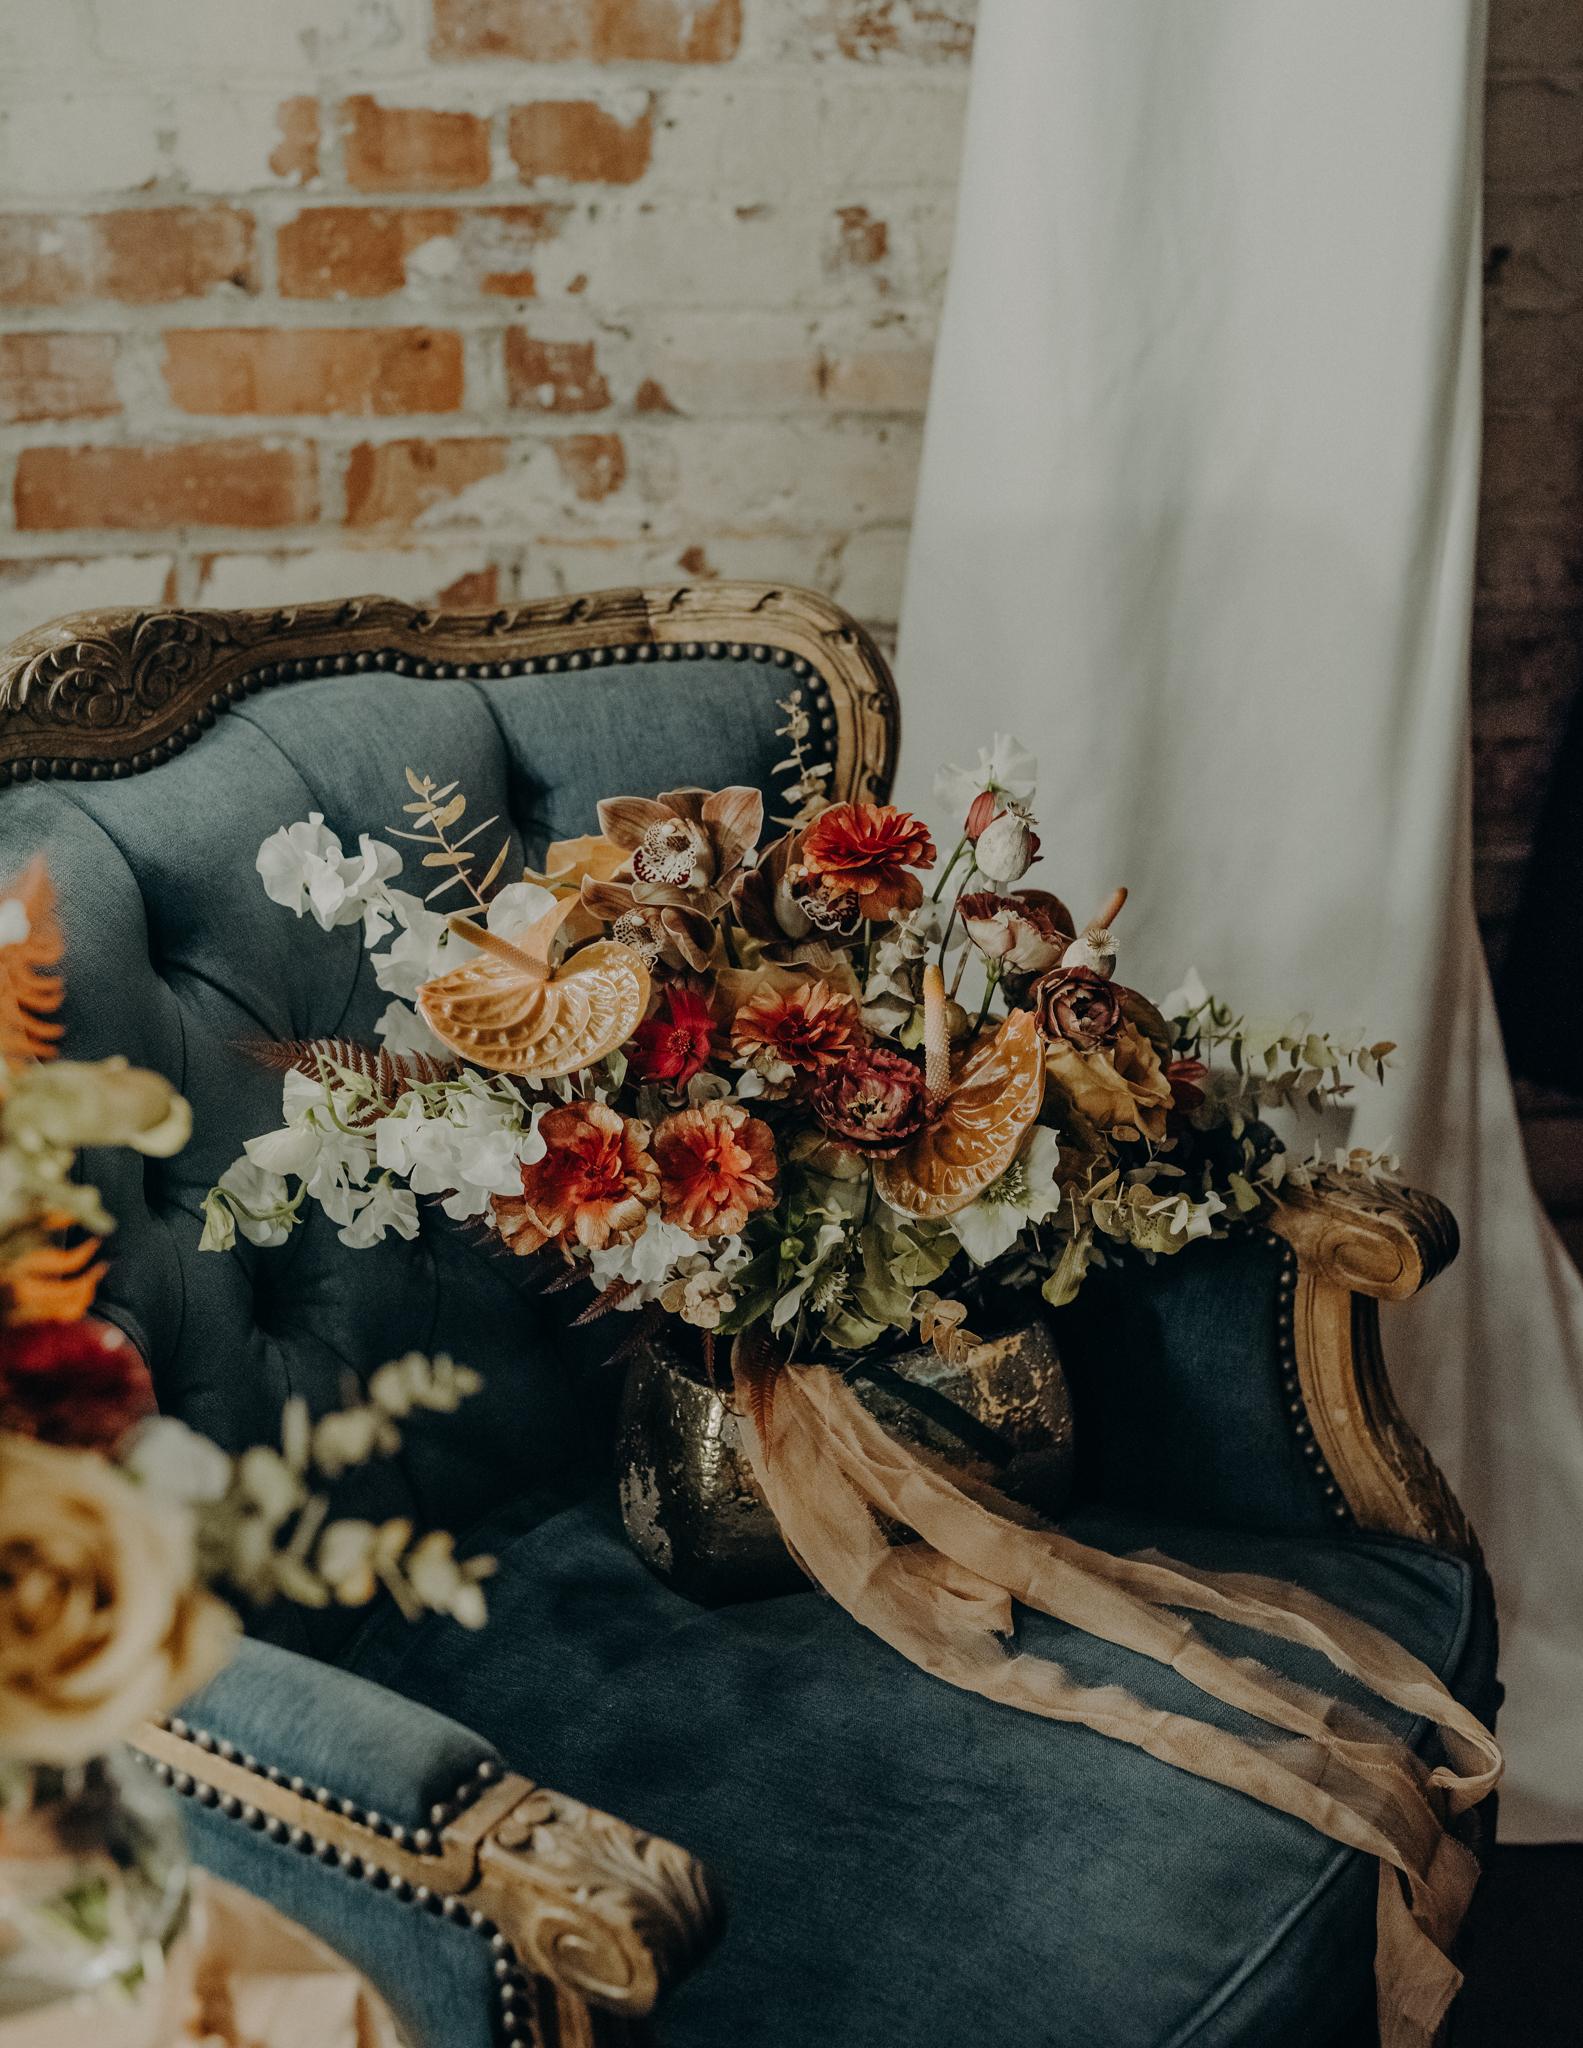 Wedding Photo LA - wedding photographer in los angeles - millwick wedding venue -isaiahandtaylor.com-004.jpg